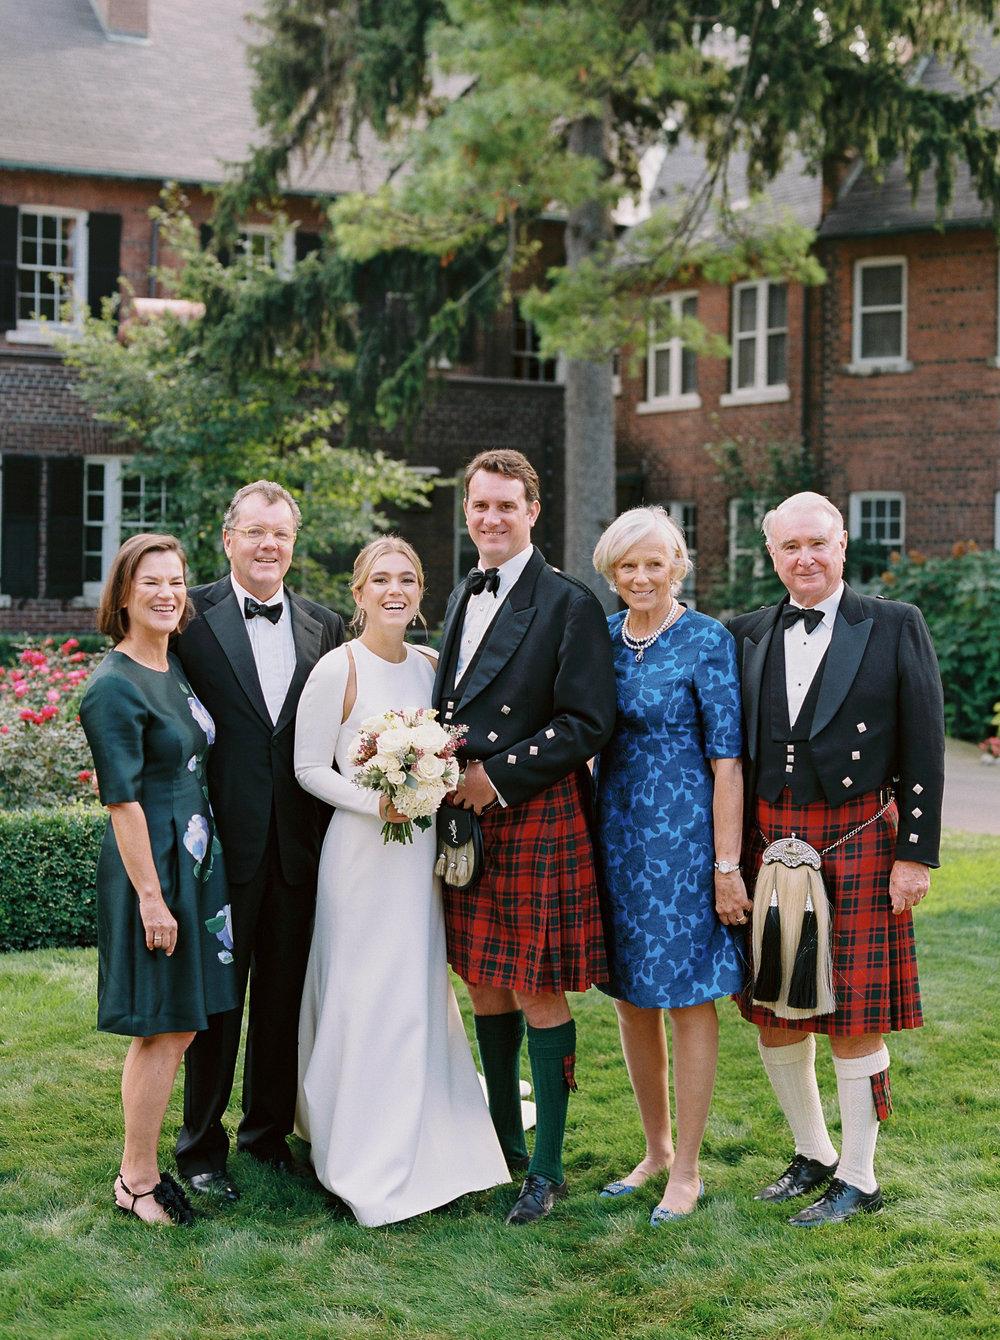 0224-Geneva-Ian-Wedding-Toronto Golf Club-When He Found Her-TorontoPhotographer.jpg